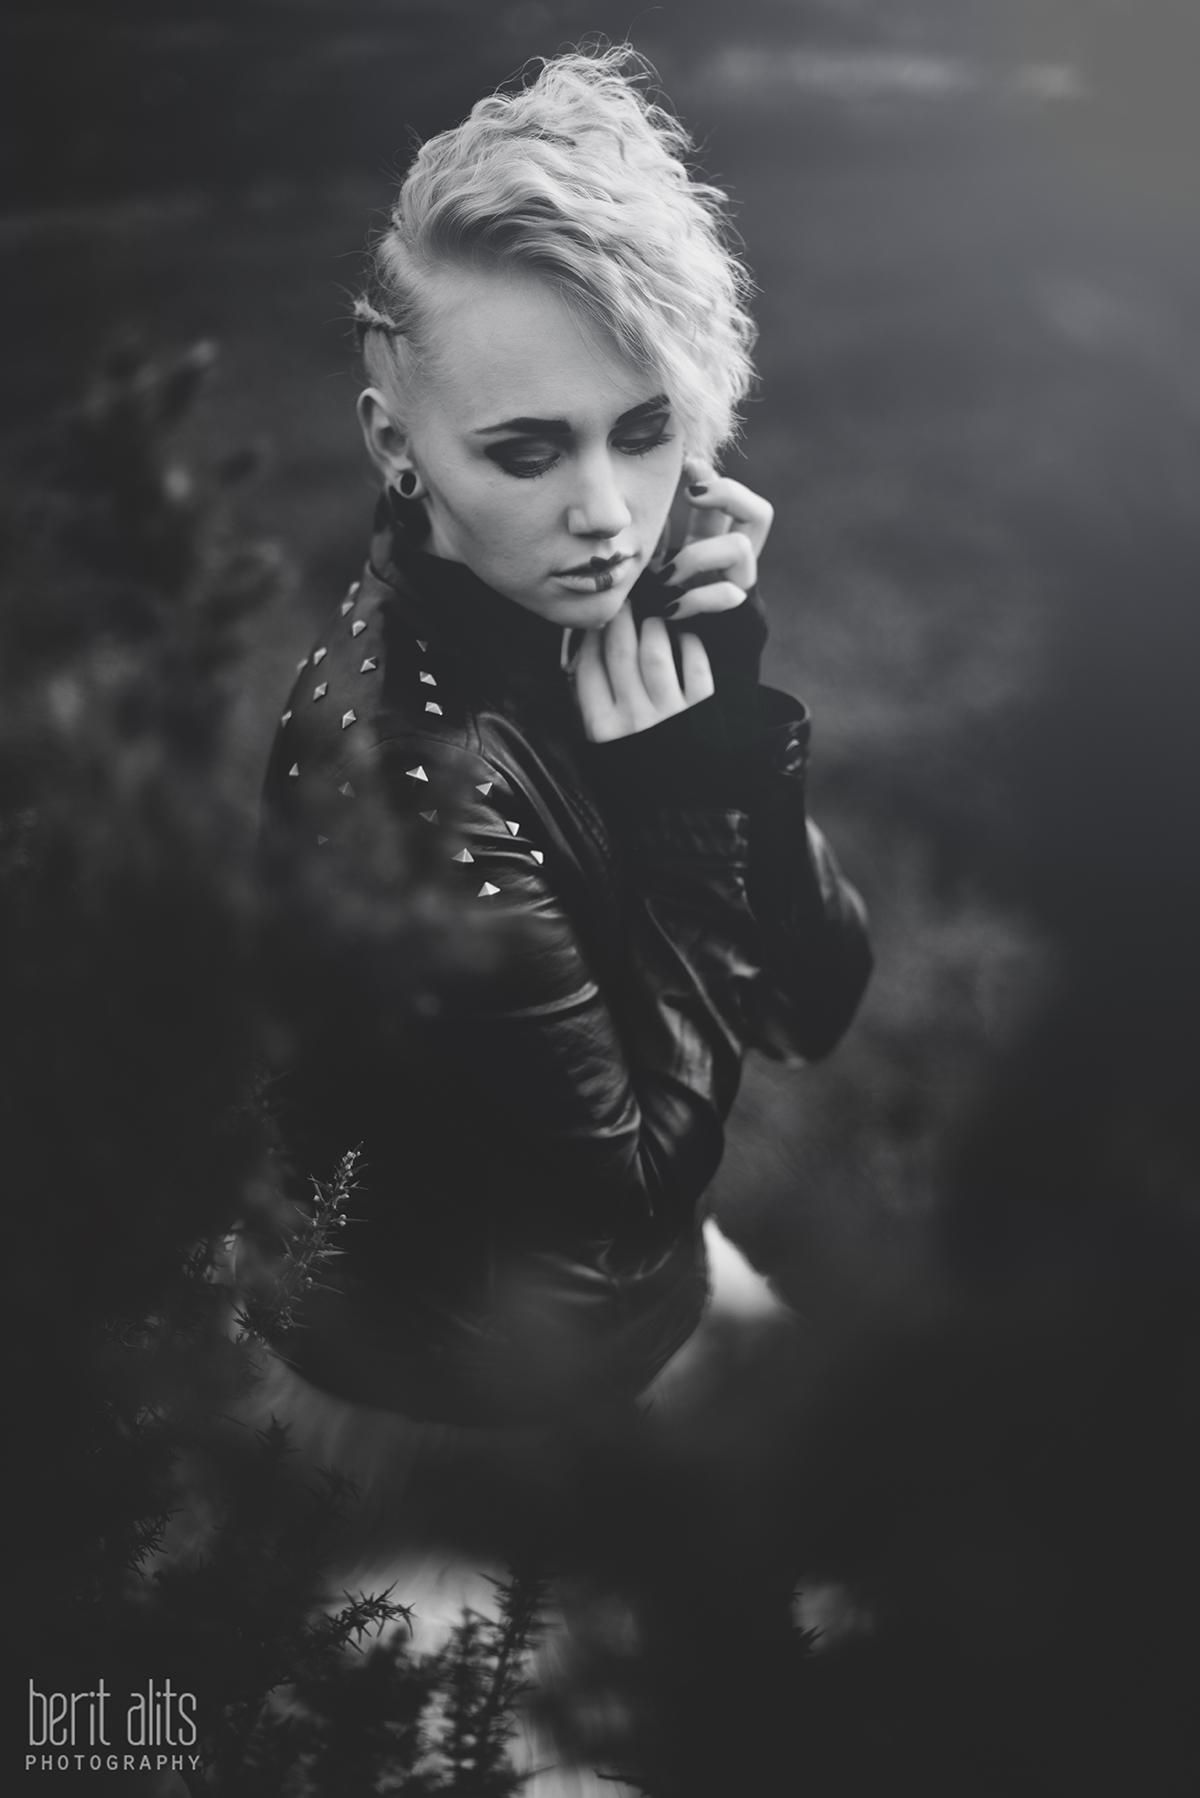 11_creative_portrait_high_key_natural_light_bright_model_makeup_hair_blonde_clonmel_tipperary_ireland_portrait_photography_nikon_d800_50_mm_berit_alits_slievenamon_mountain_nature